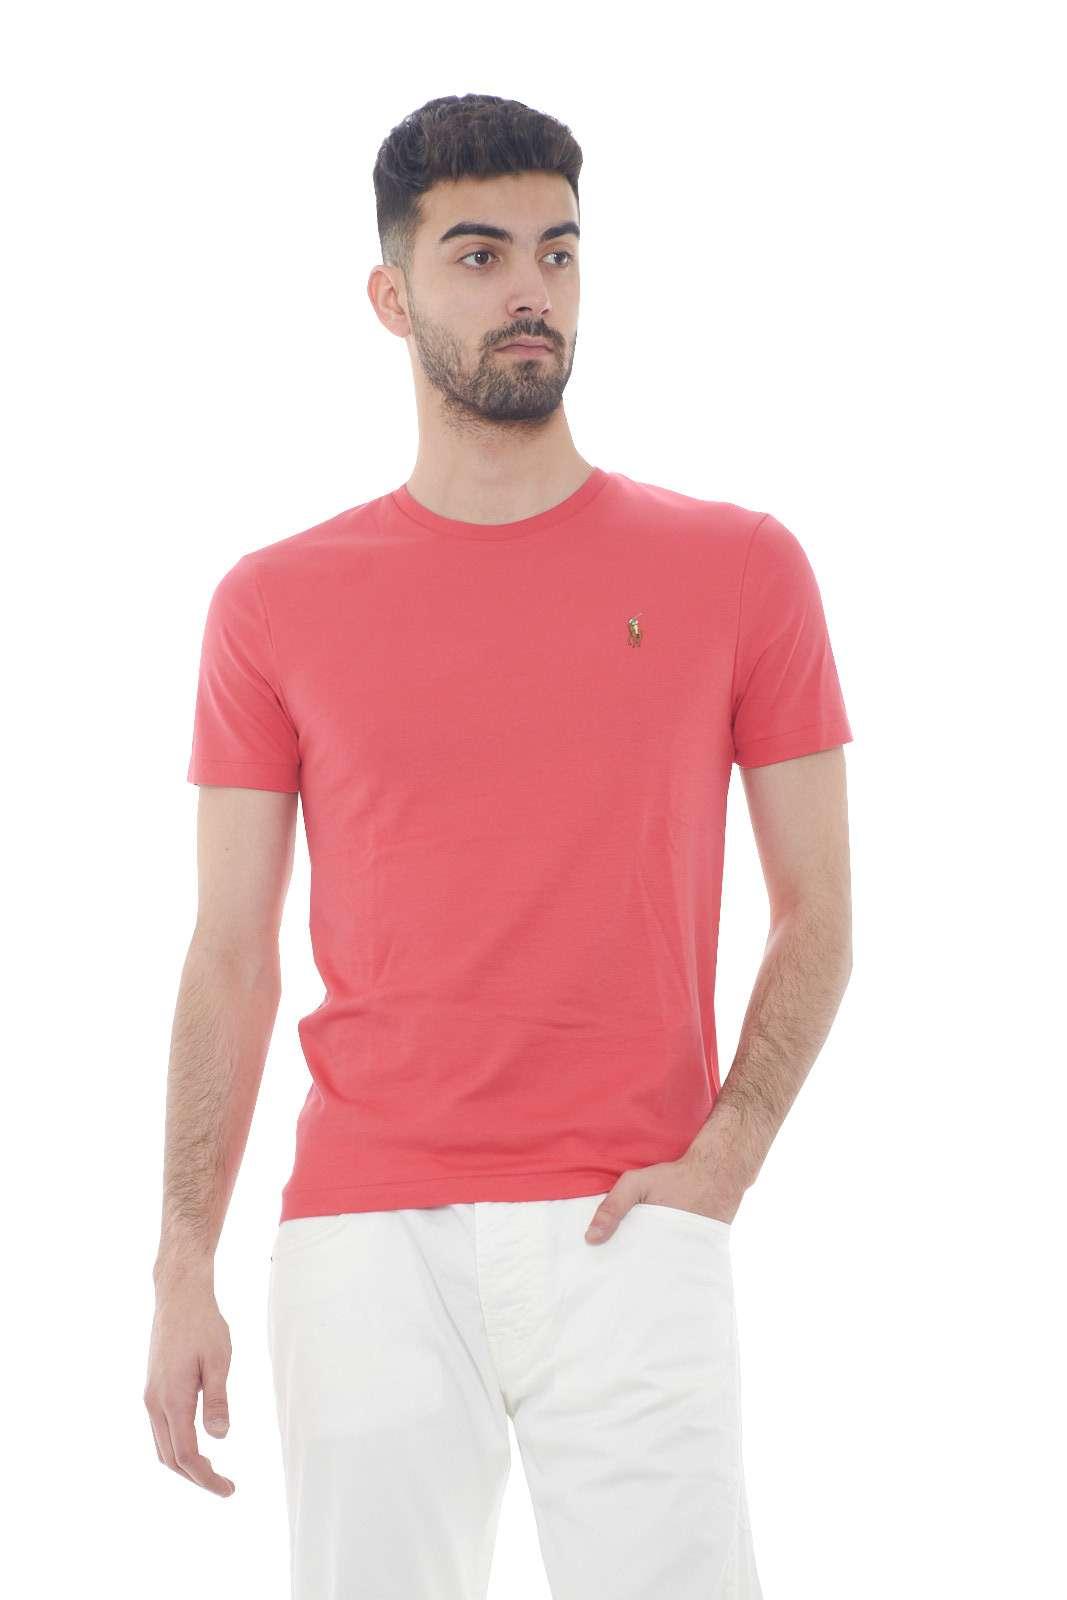 https://www.parmax.com/media/catalog/product/a/i/PE-outlet_parmax-t-shirt-uomo-Ralph-Lauren-710740727-A.jpg